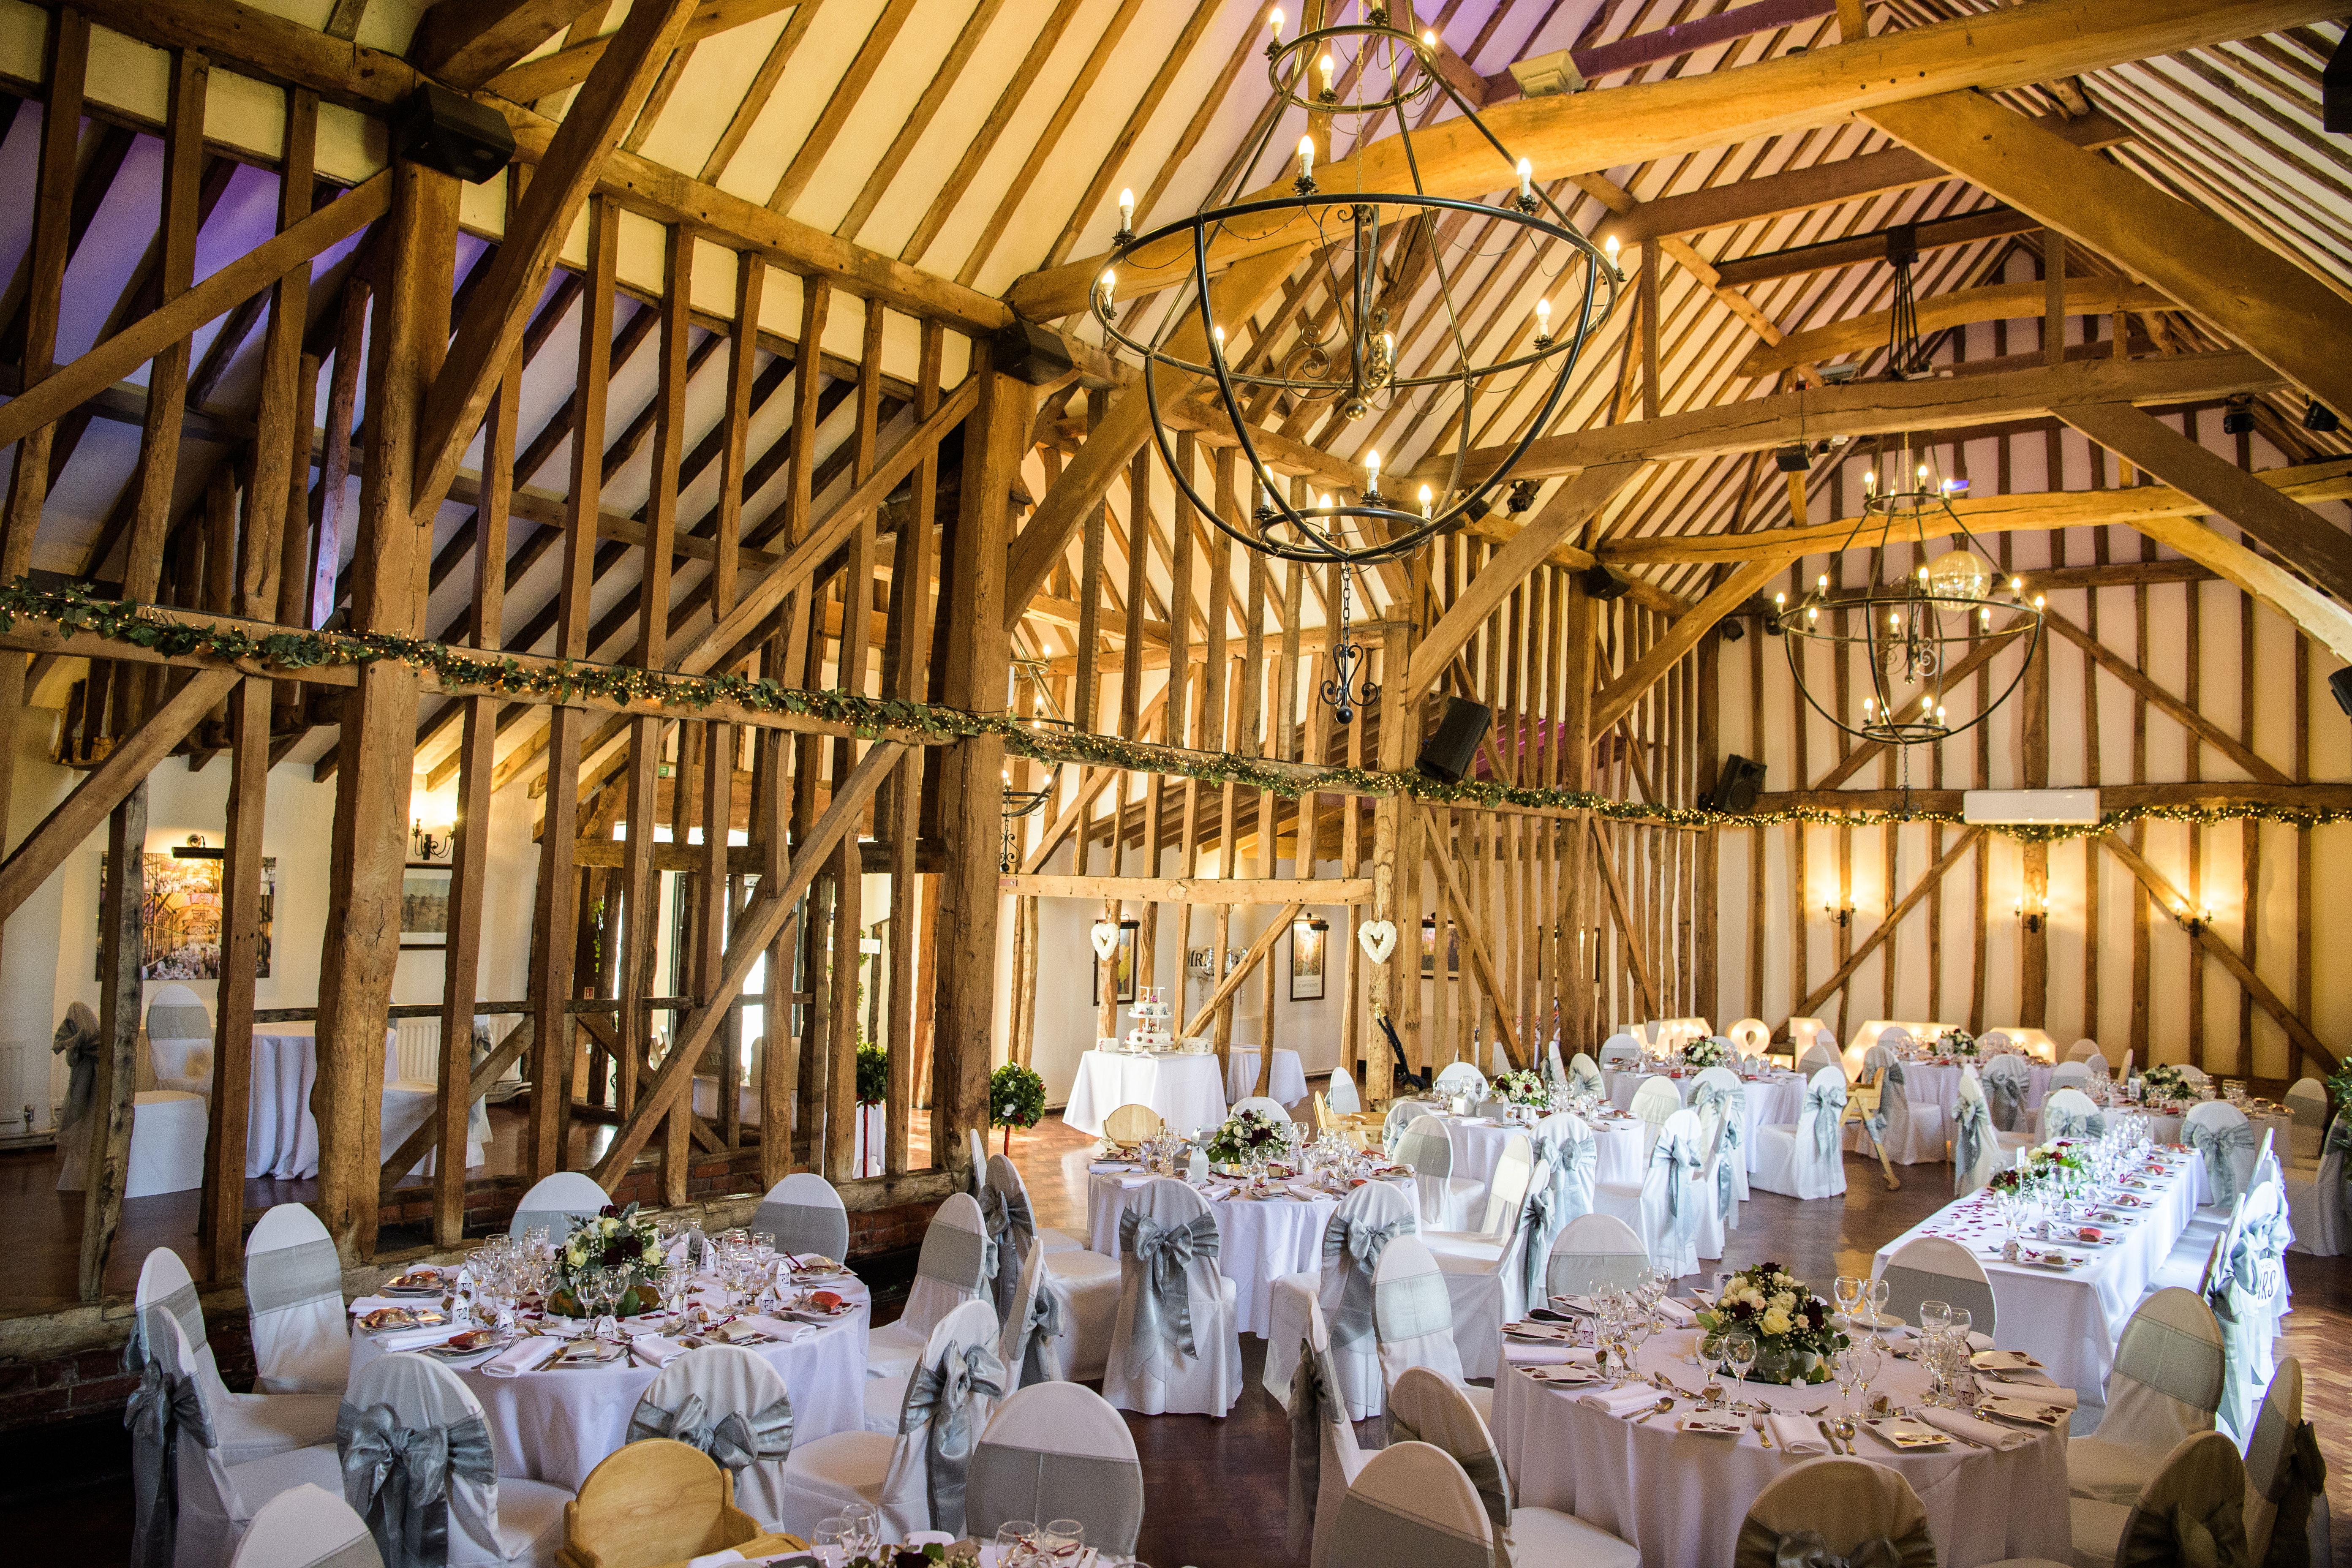 5 reasons to choose a barn wedding